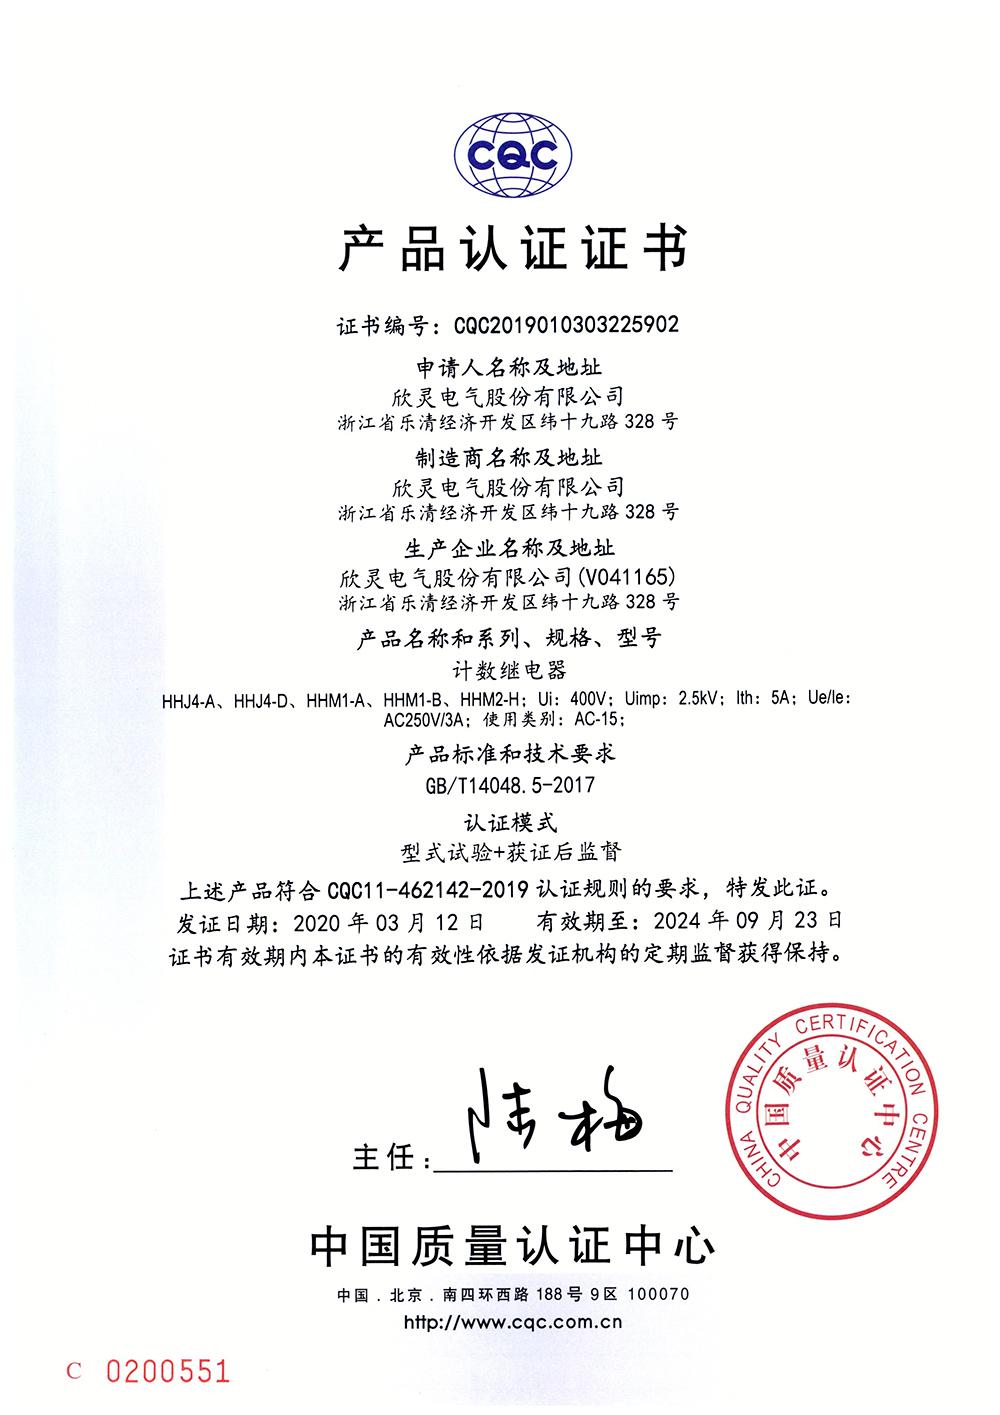 HHJ4-A、HHJ4-D、HHM1-A、HHM1-B、HHM2-H计数继电器 CQC证书【CQC】